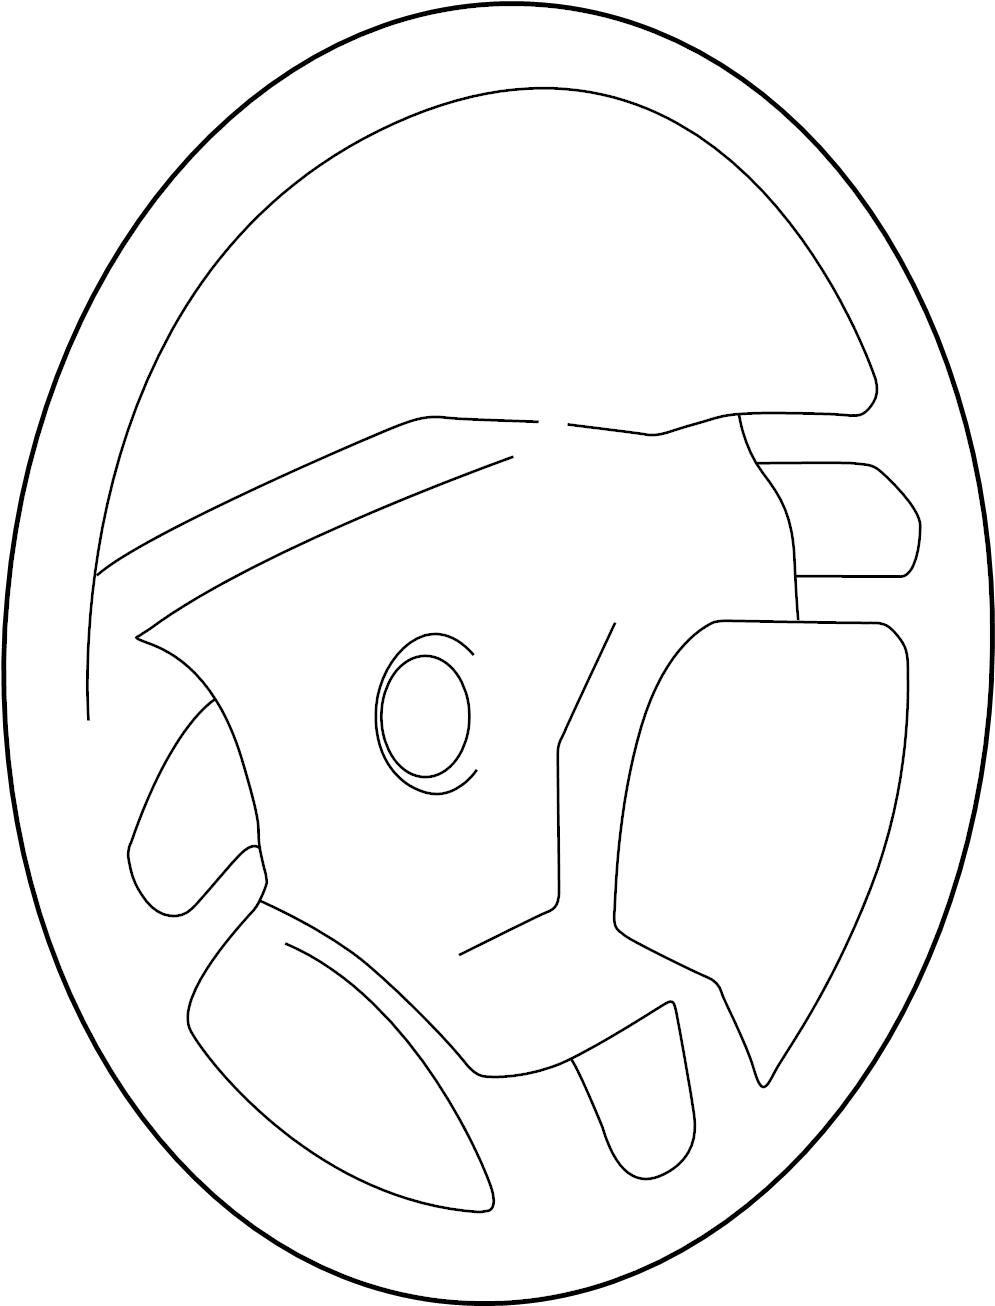 Mazda MIATA Steering Wheel. Miata MX5; Wood. W/WOOD WHEEL